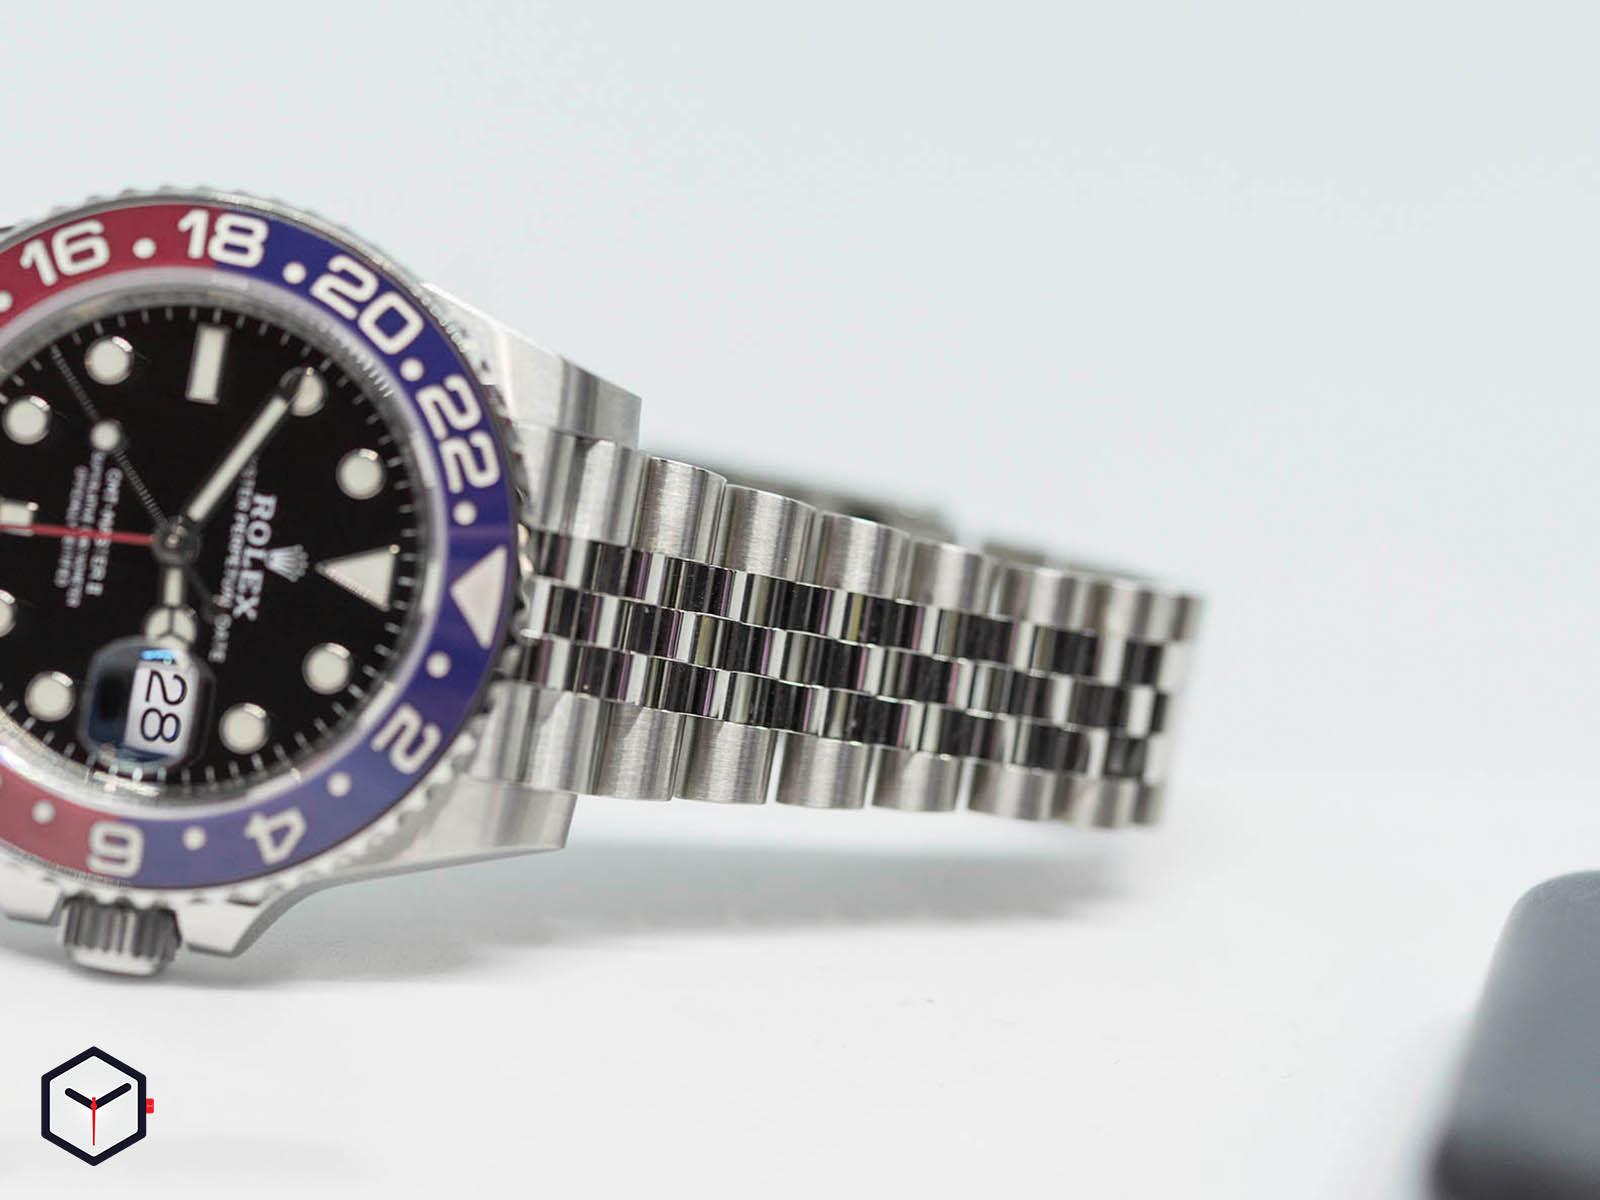 126710blro-rolex-gmt-master-2-pepsi-3.jpg